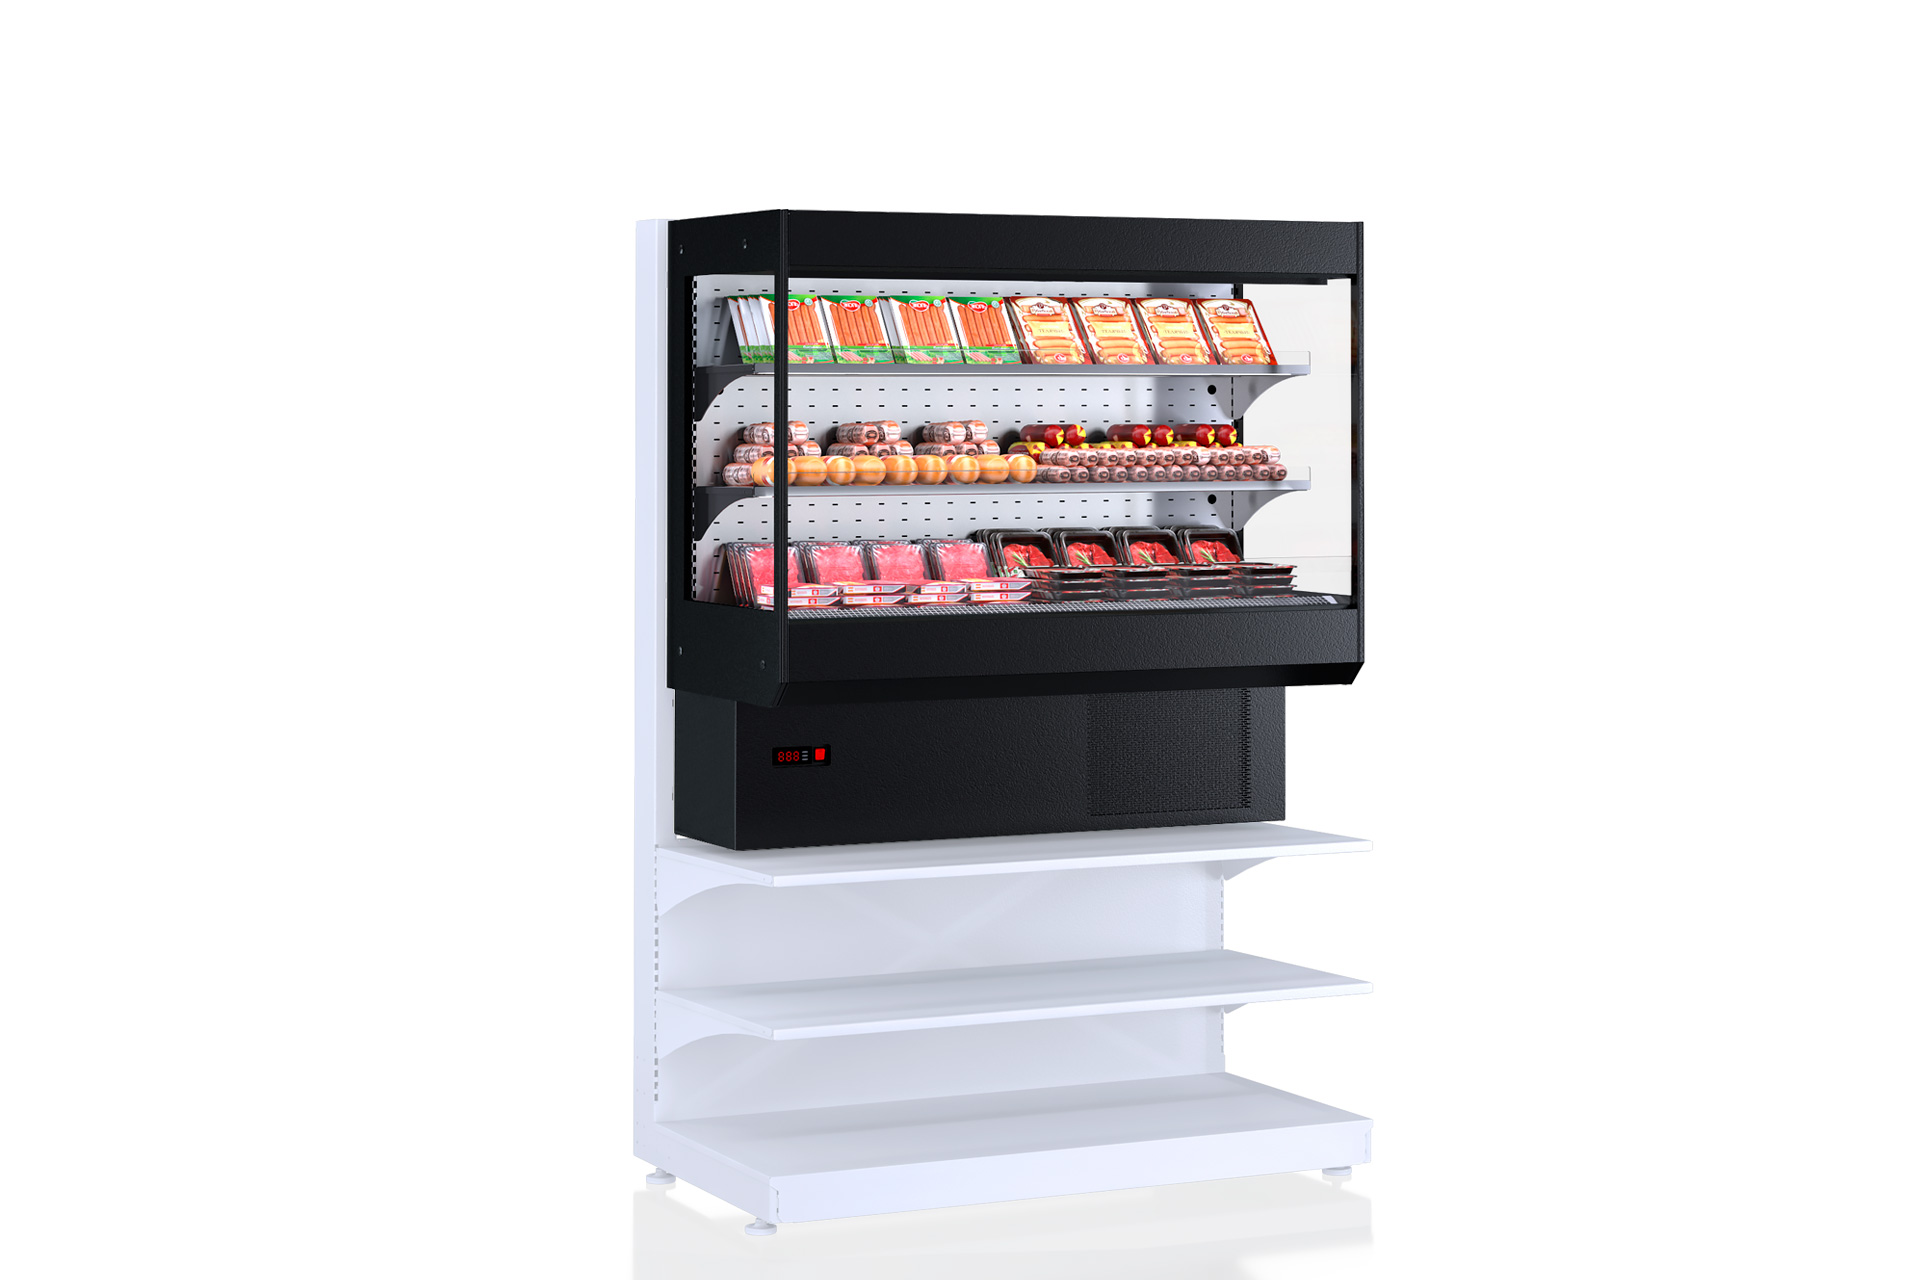 Refrigerated cabinets Kansas АV 063 HMT D 129-D650/D800A-100/125